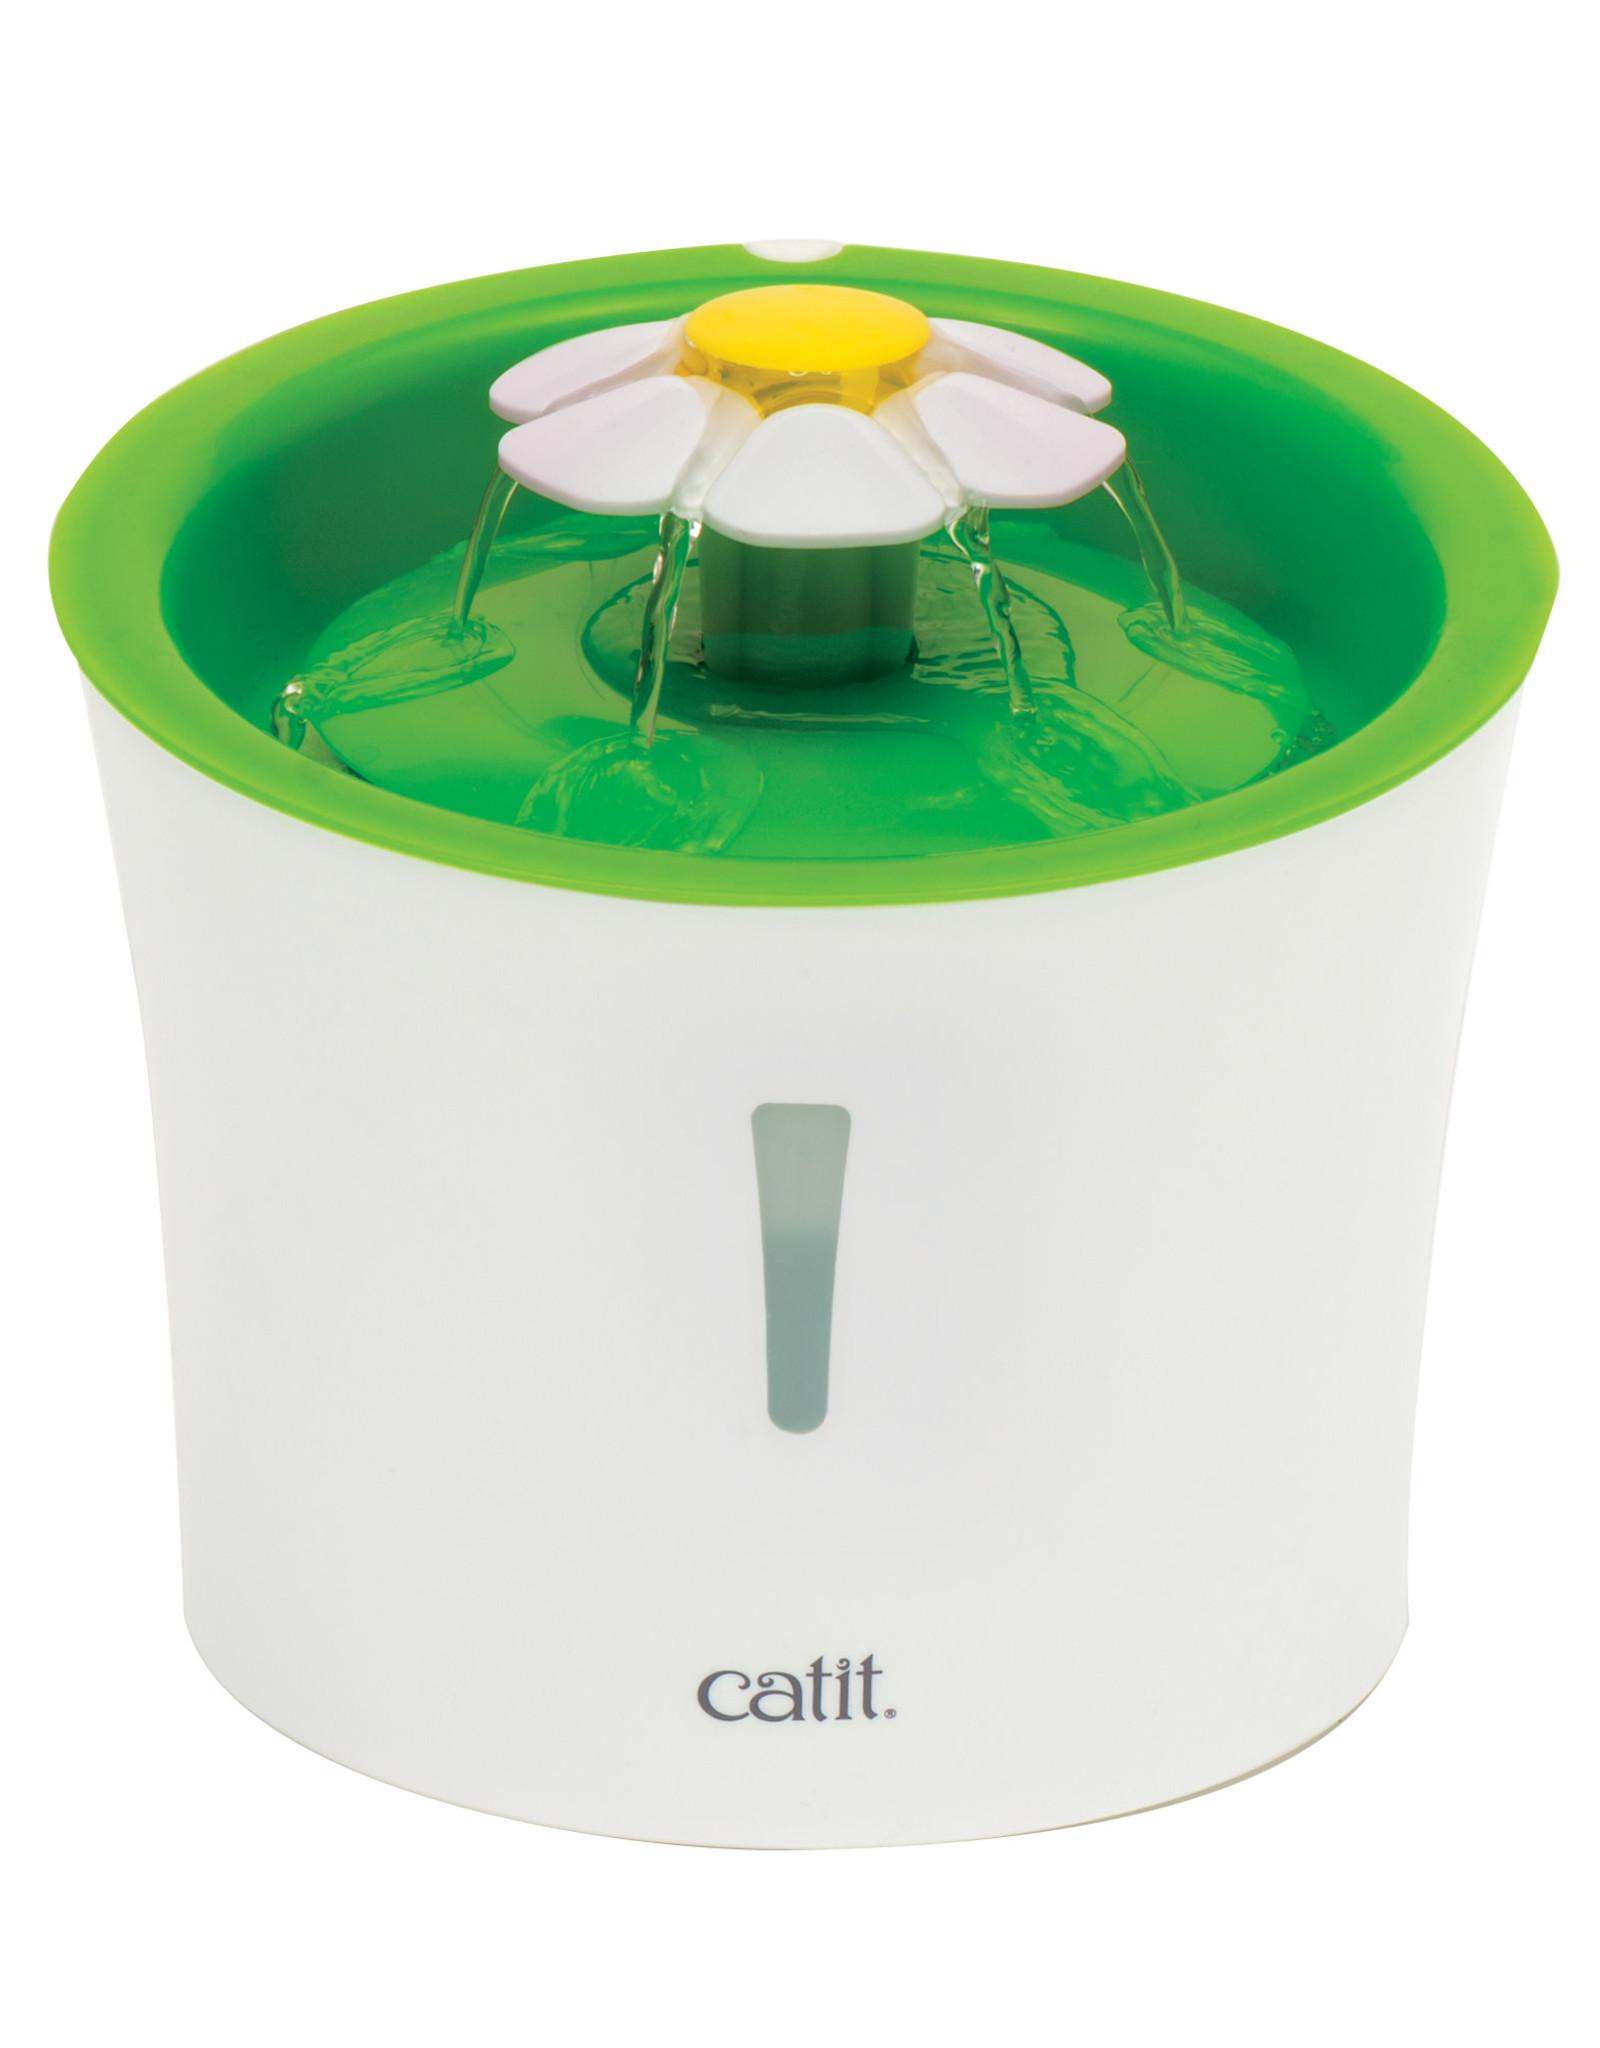 Hagen Catit  Drinking Flower Fountain 2.0